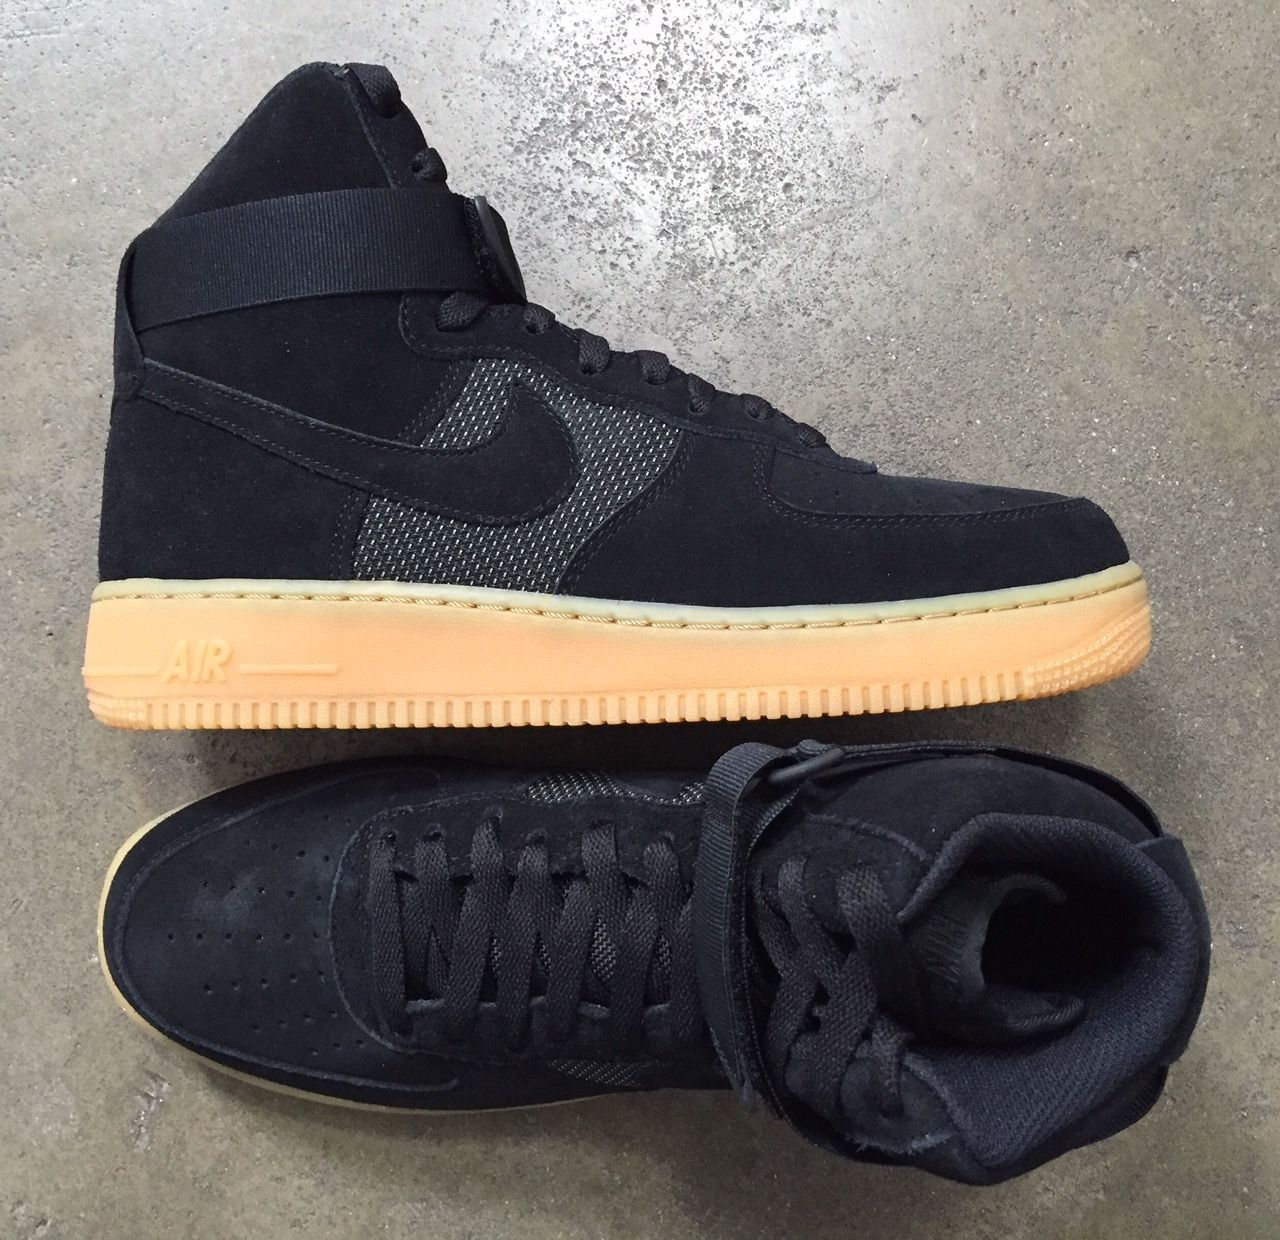 Nike Air Force 1 High LV8 Black Gum Light Brown size 9.5 (  806403-003) 98b63ec01e